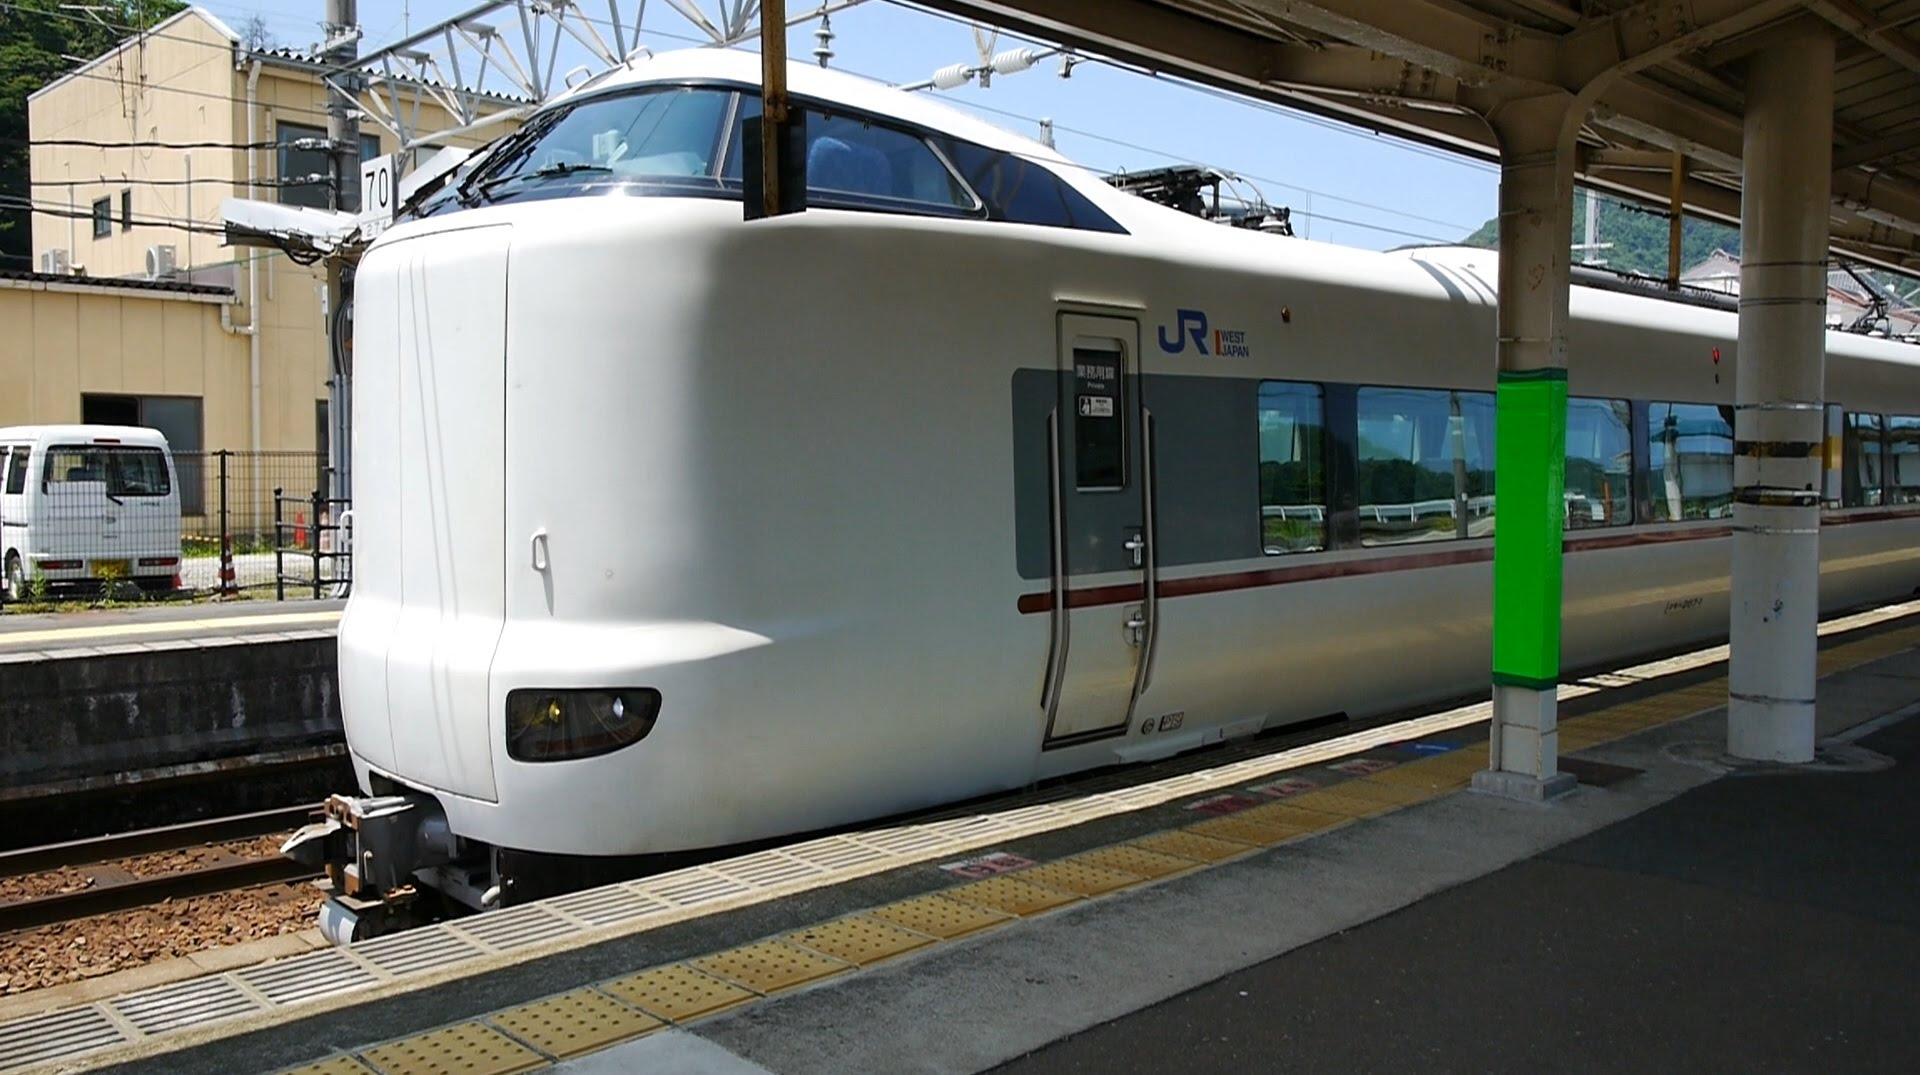 【60fps】JR西日本 特急こうのとり16号 超広角車窓 進行左側 城崎温泉~福知山~新大阪